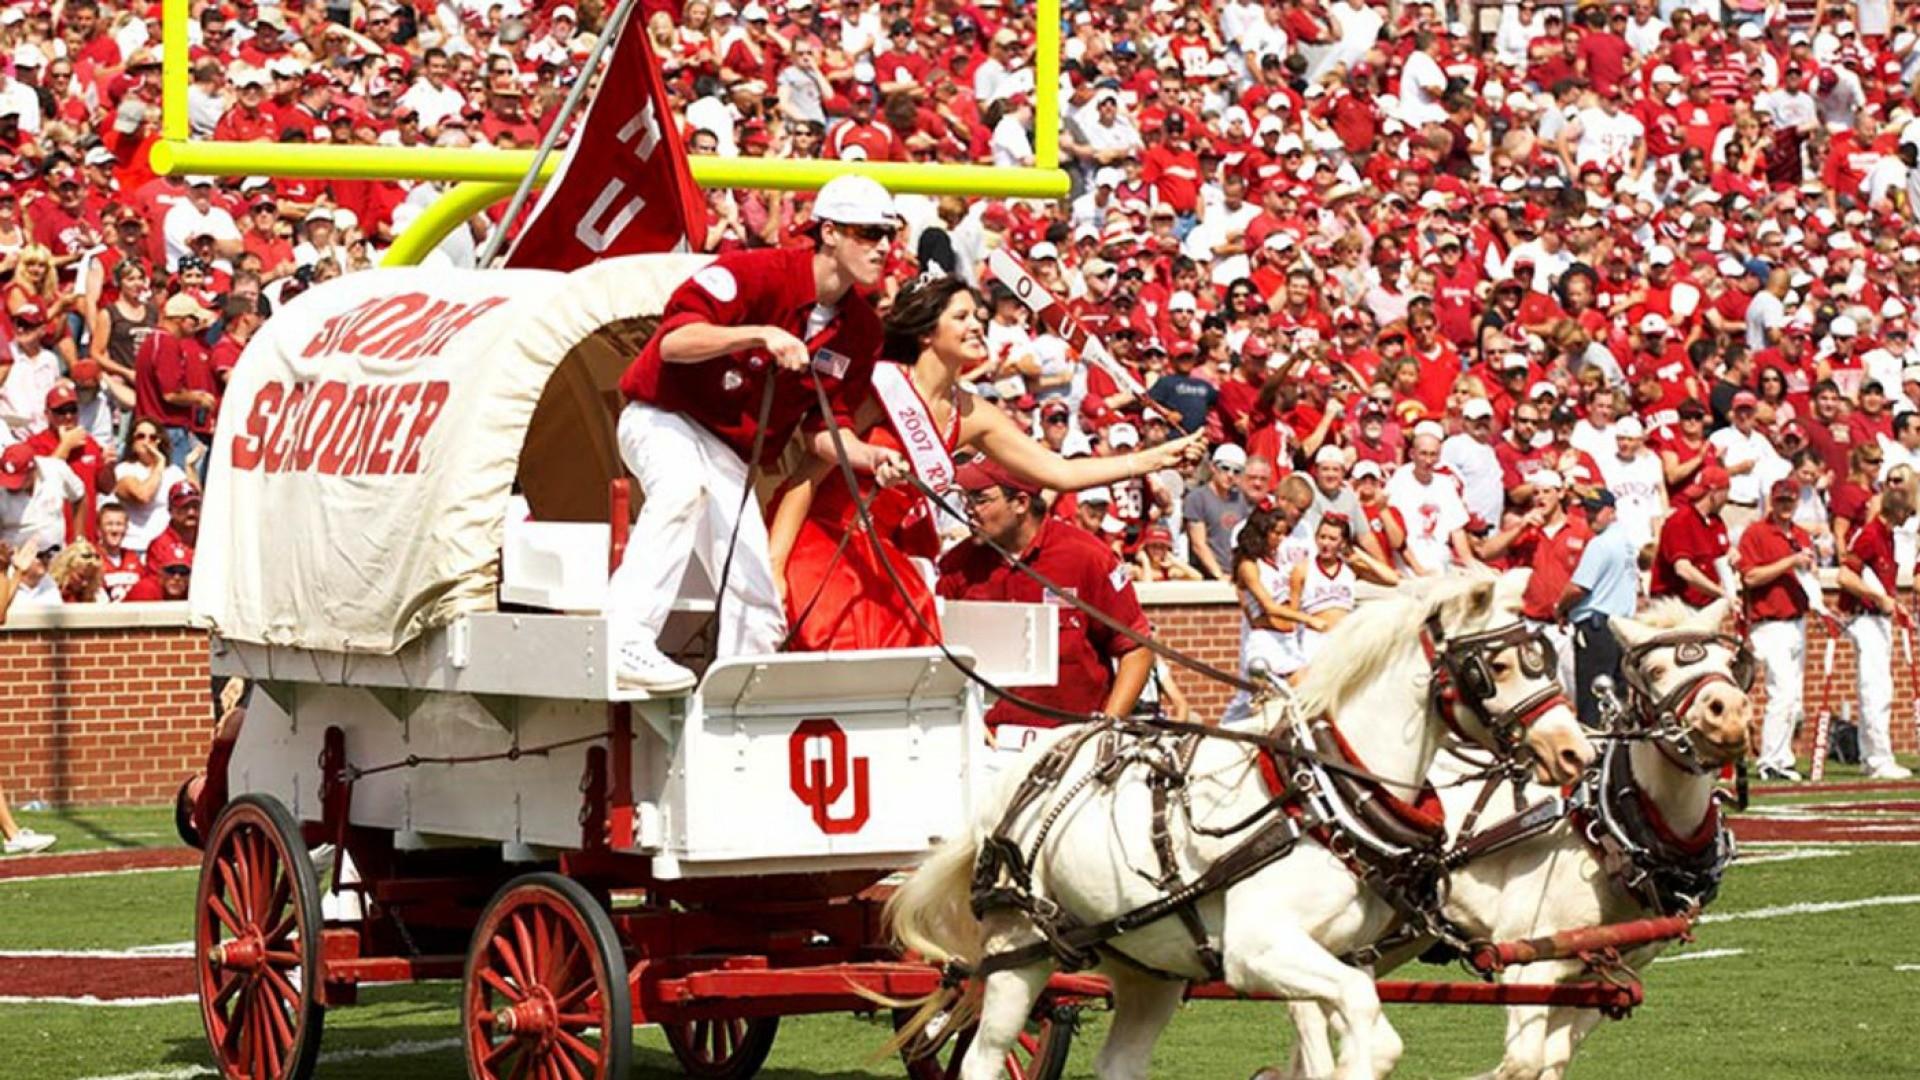 … Oklahoma Sooners Stadium Wallpaper Sooners Background …